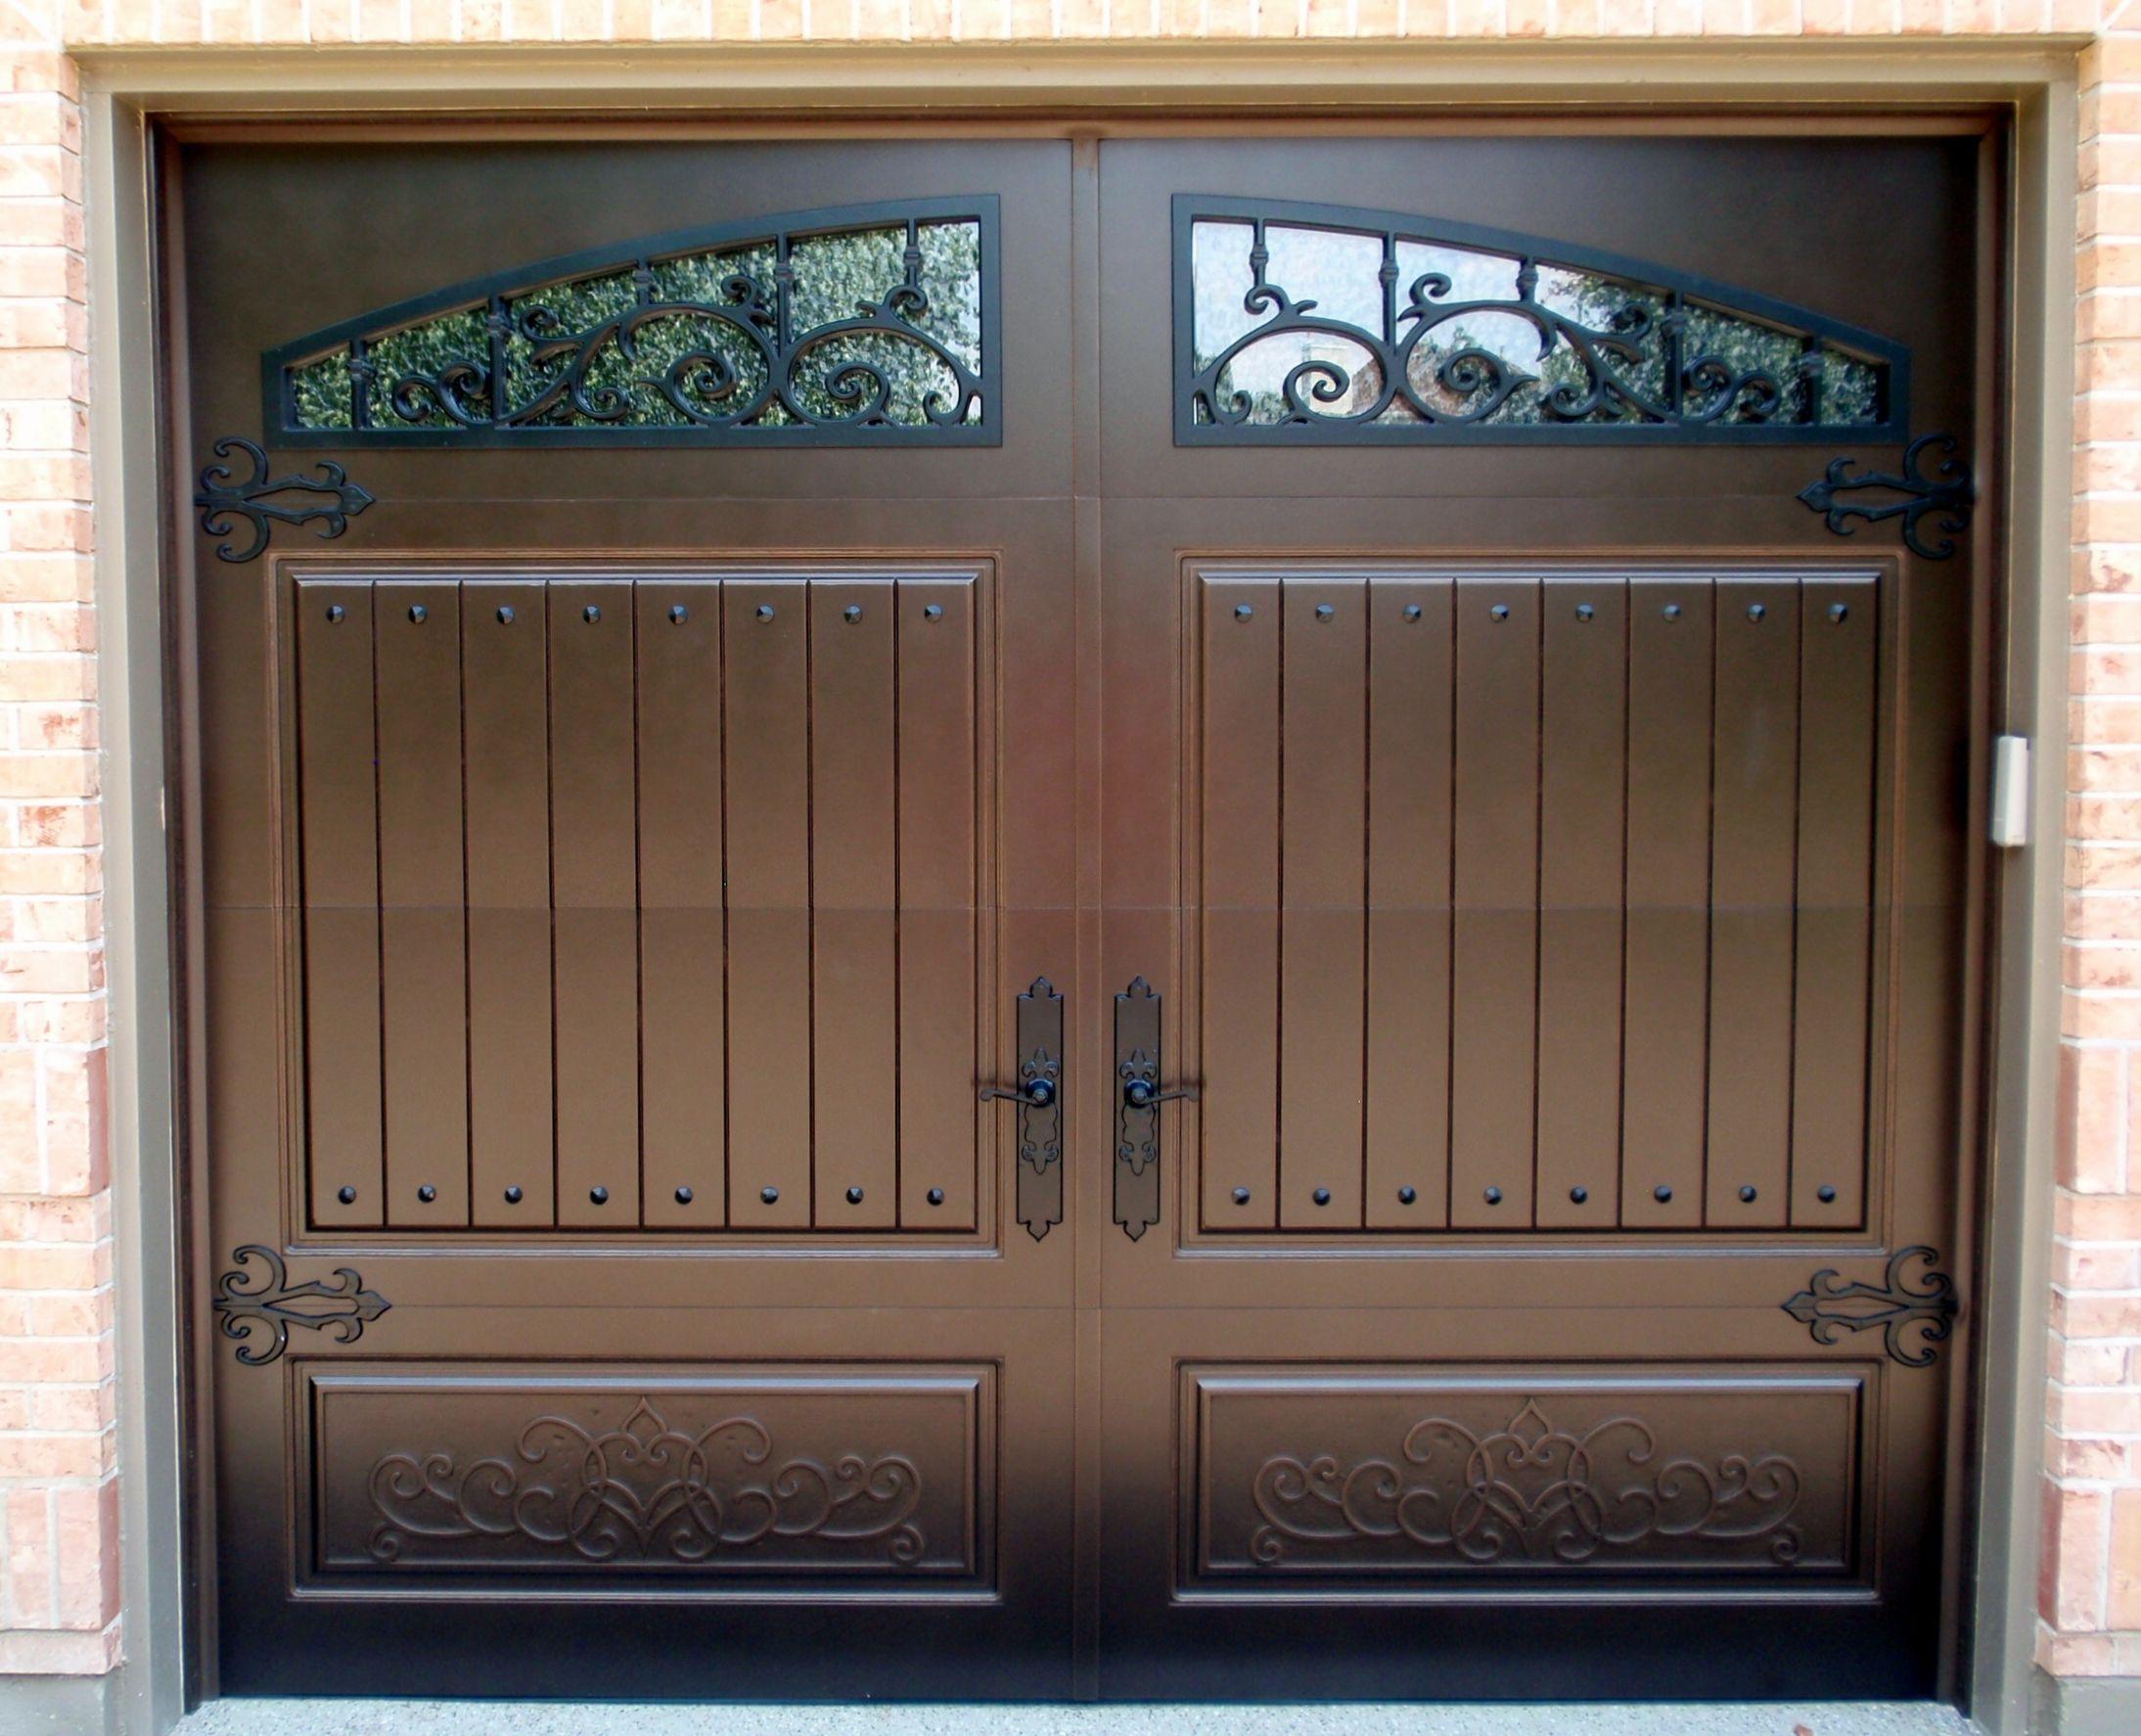 single car garage doors. Single Car Garage Door - Finished In Masterpiece Doors Signature \ S